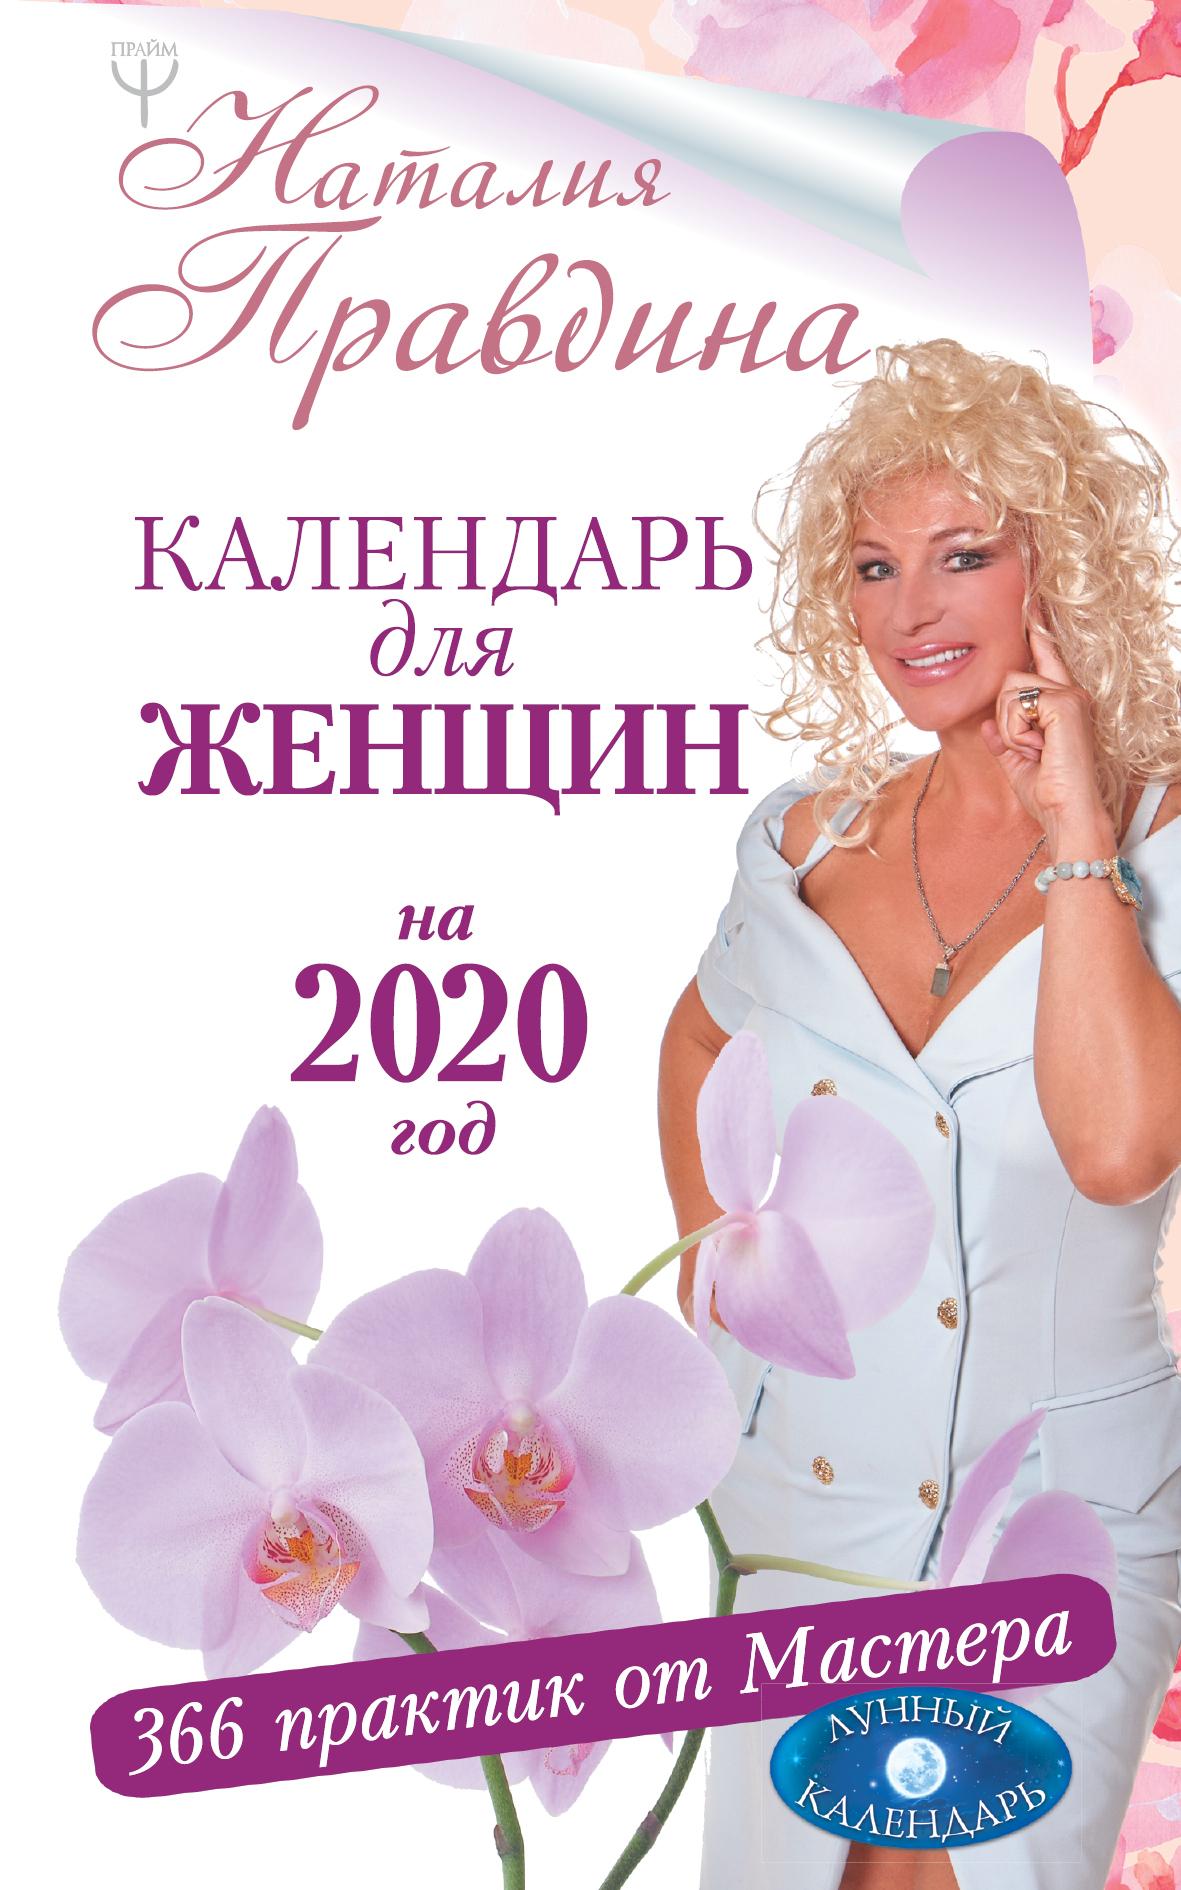 Наталия Правдина Календарь для женщин на 2020 год. 366 практик от Мастера. Лунный календарь правдина н б защитный календарь оберег от бед и неудач на 2019 год 365 практик от мастера лунный календарь